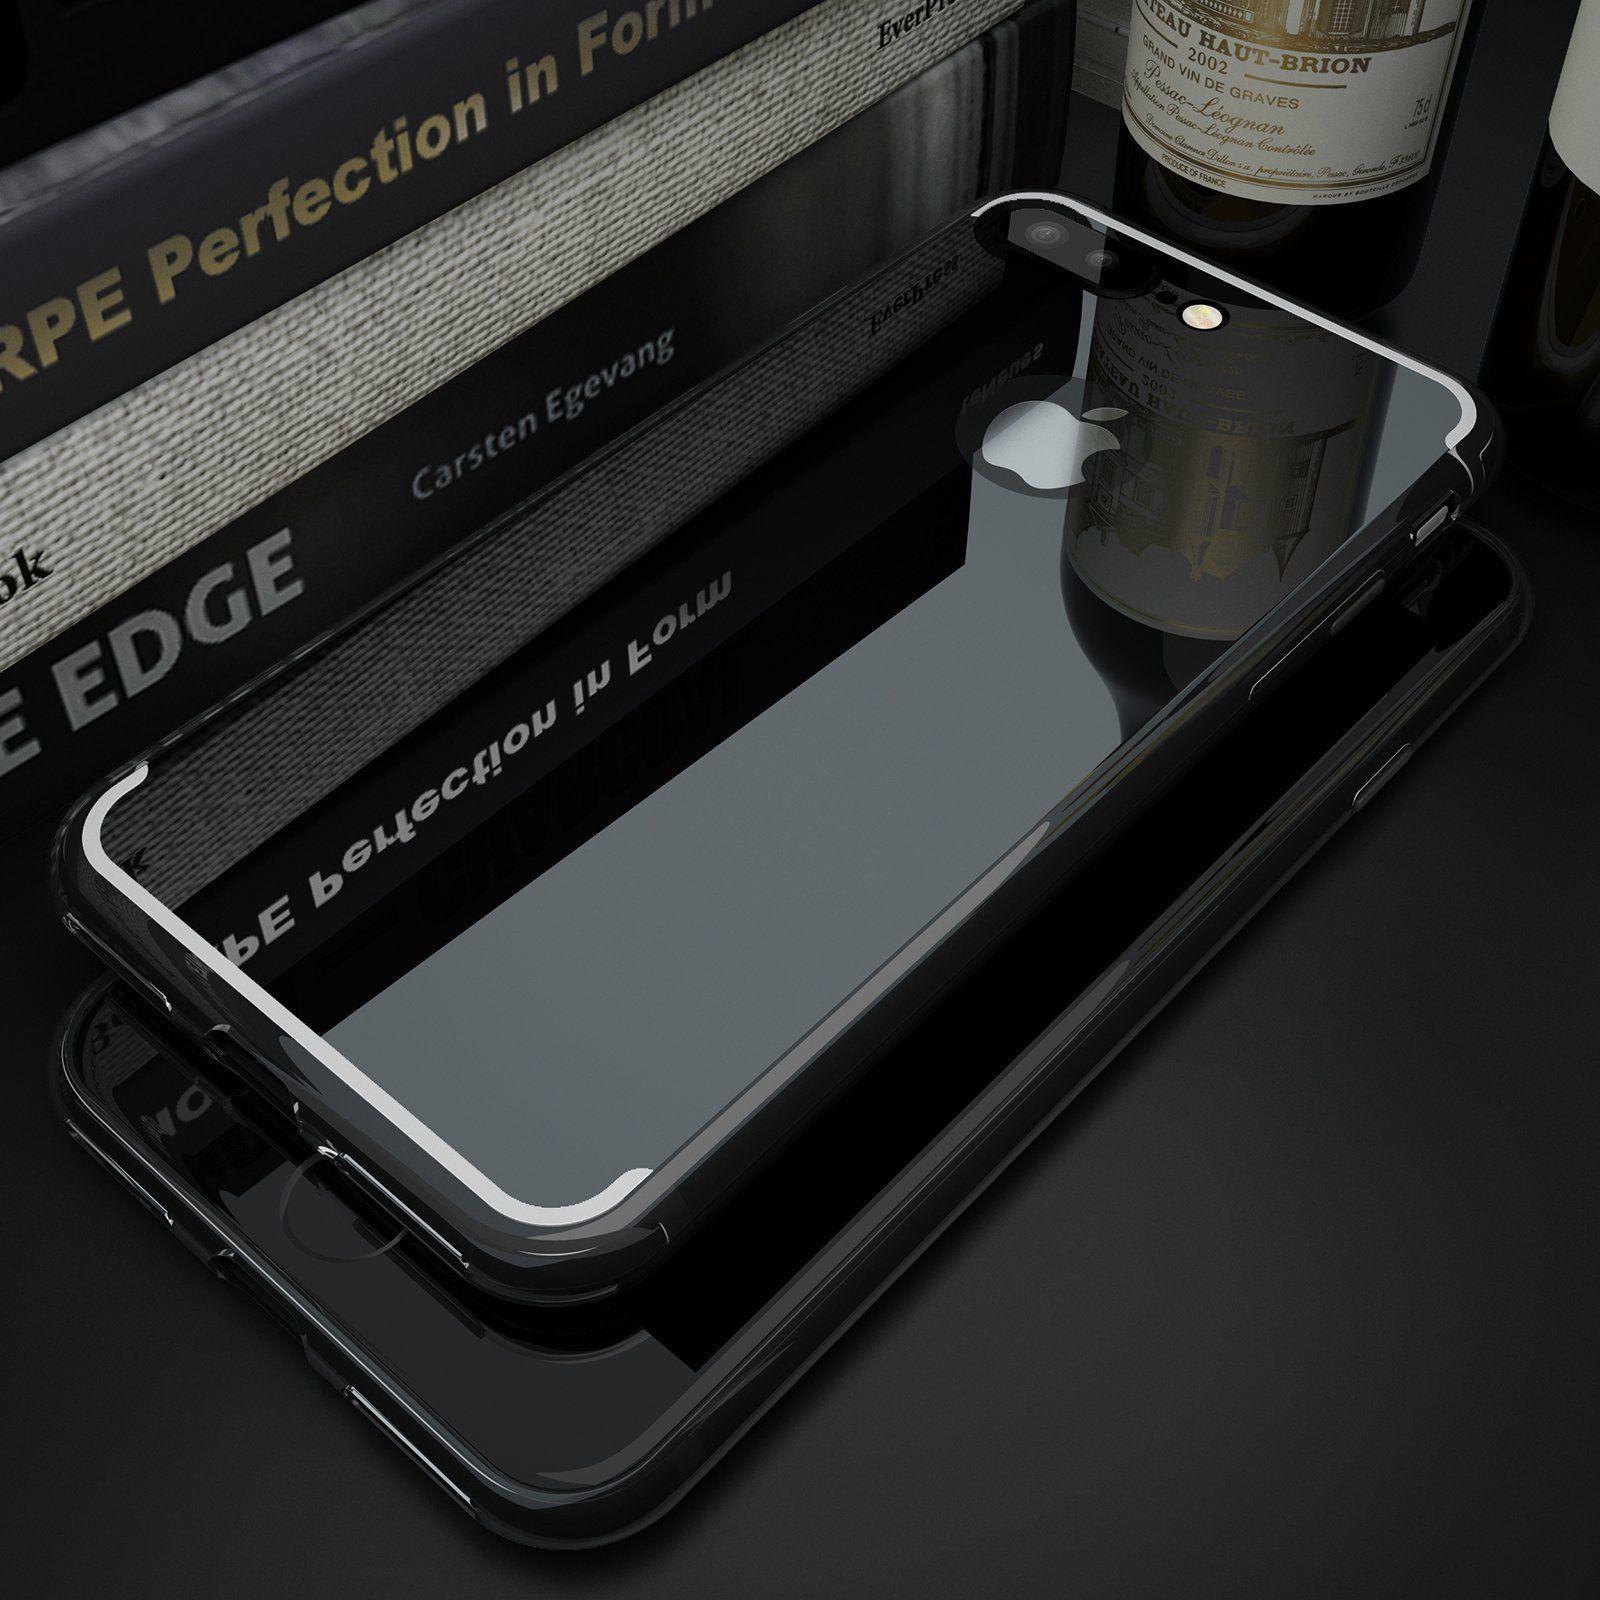 iphone 8 color black. iphone 8 color black